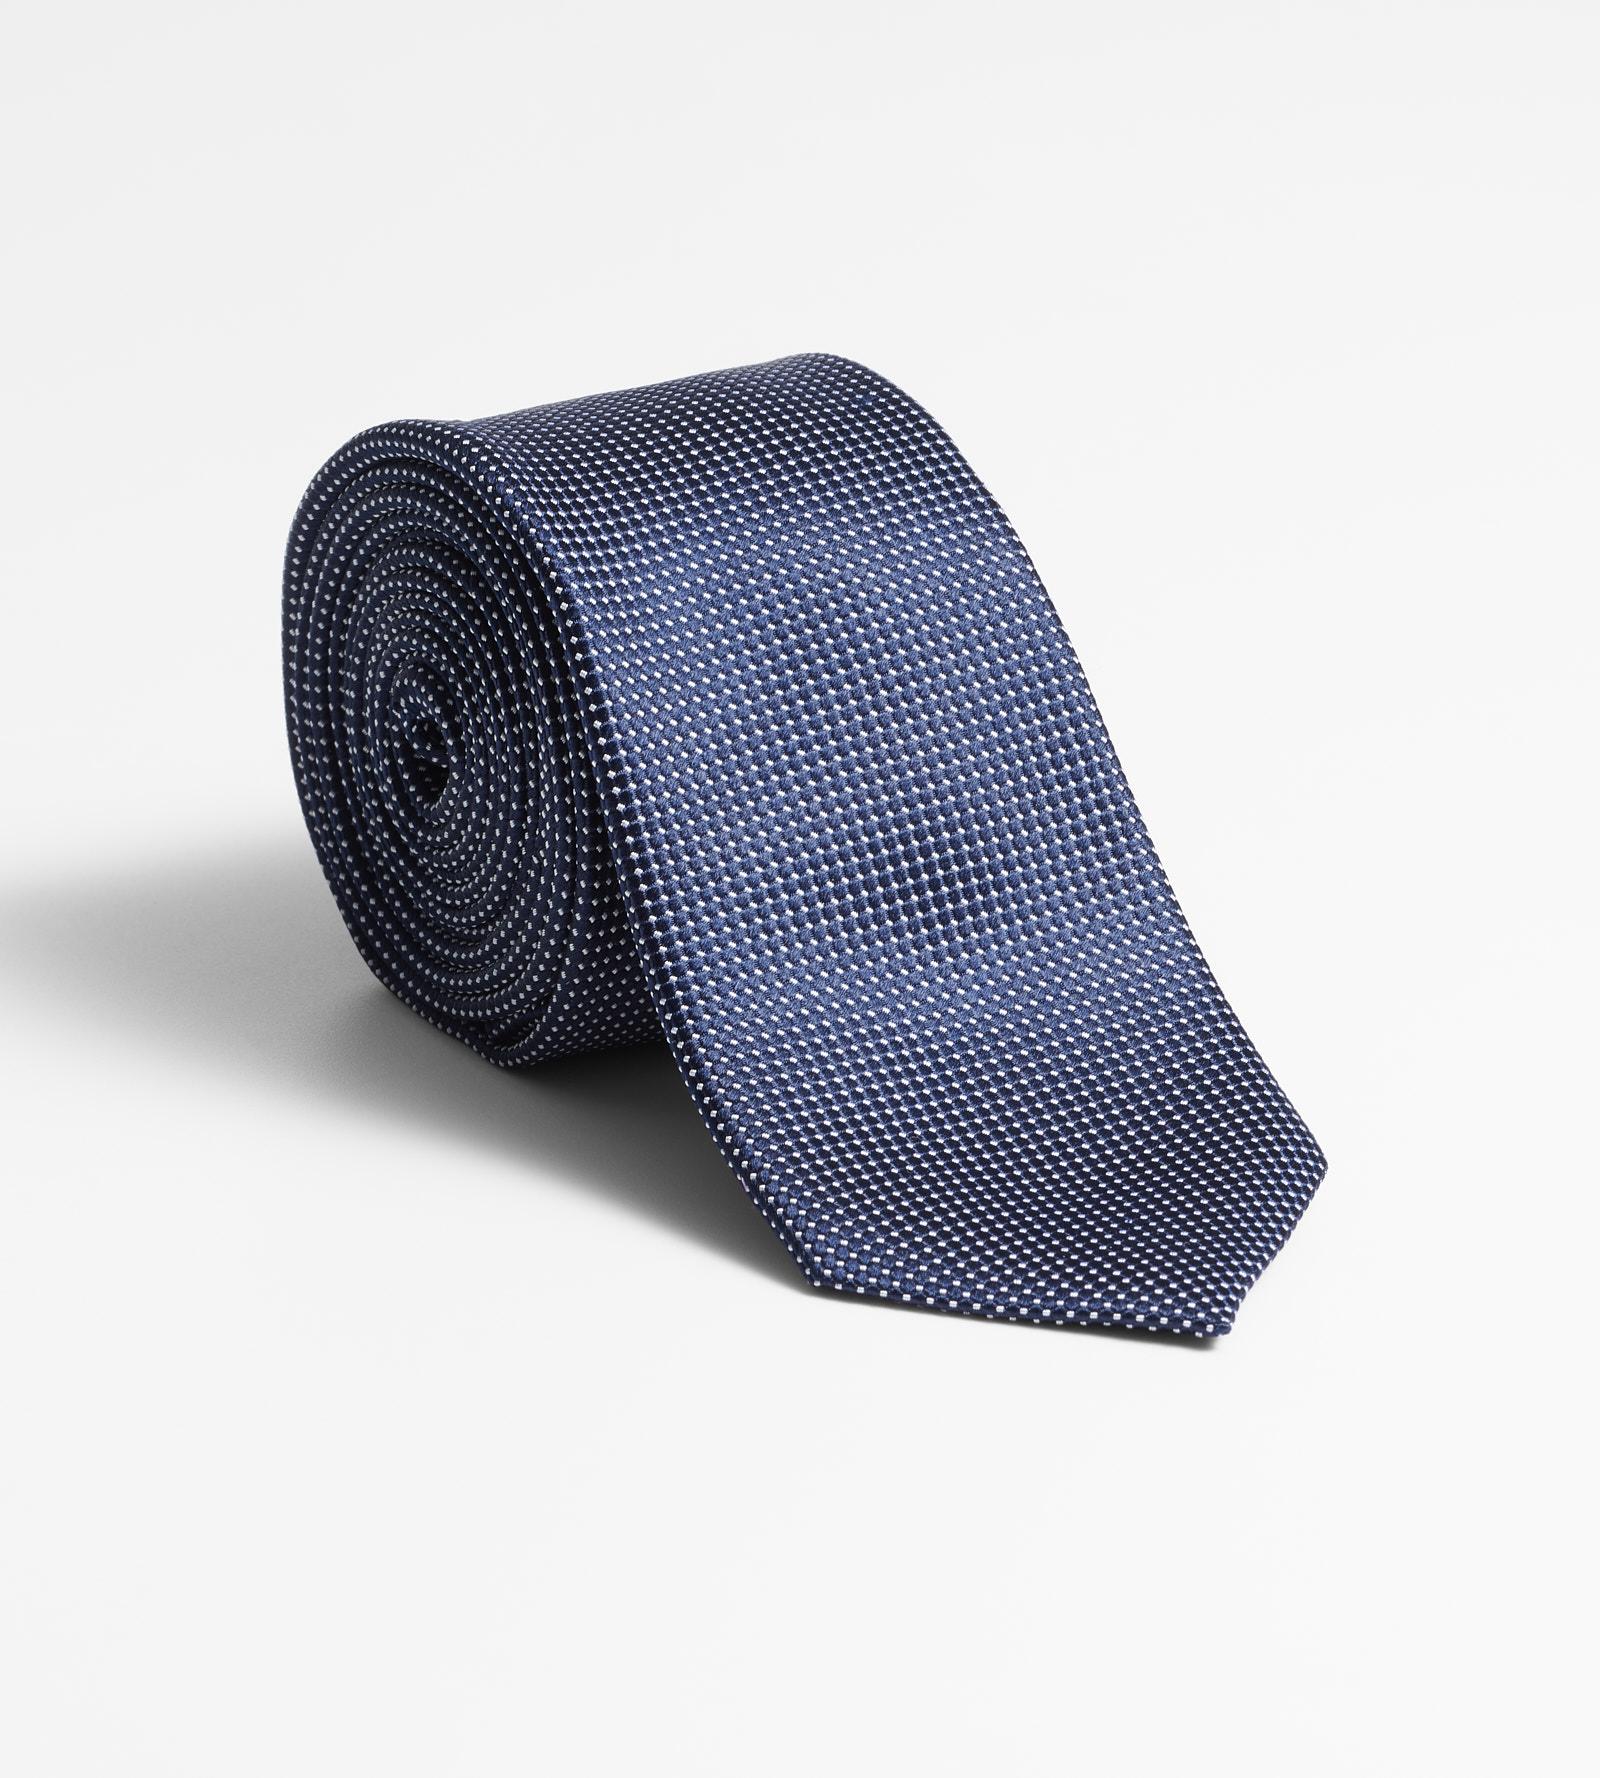 dunhill-apromintas-sotetkek-selyem-nyakkendo-dunhill-1001604-20-03.jpg